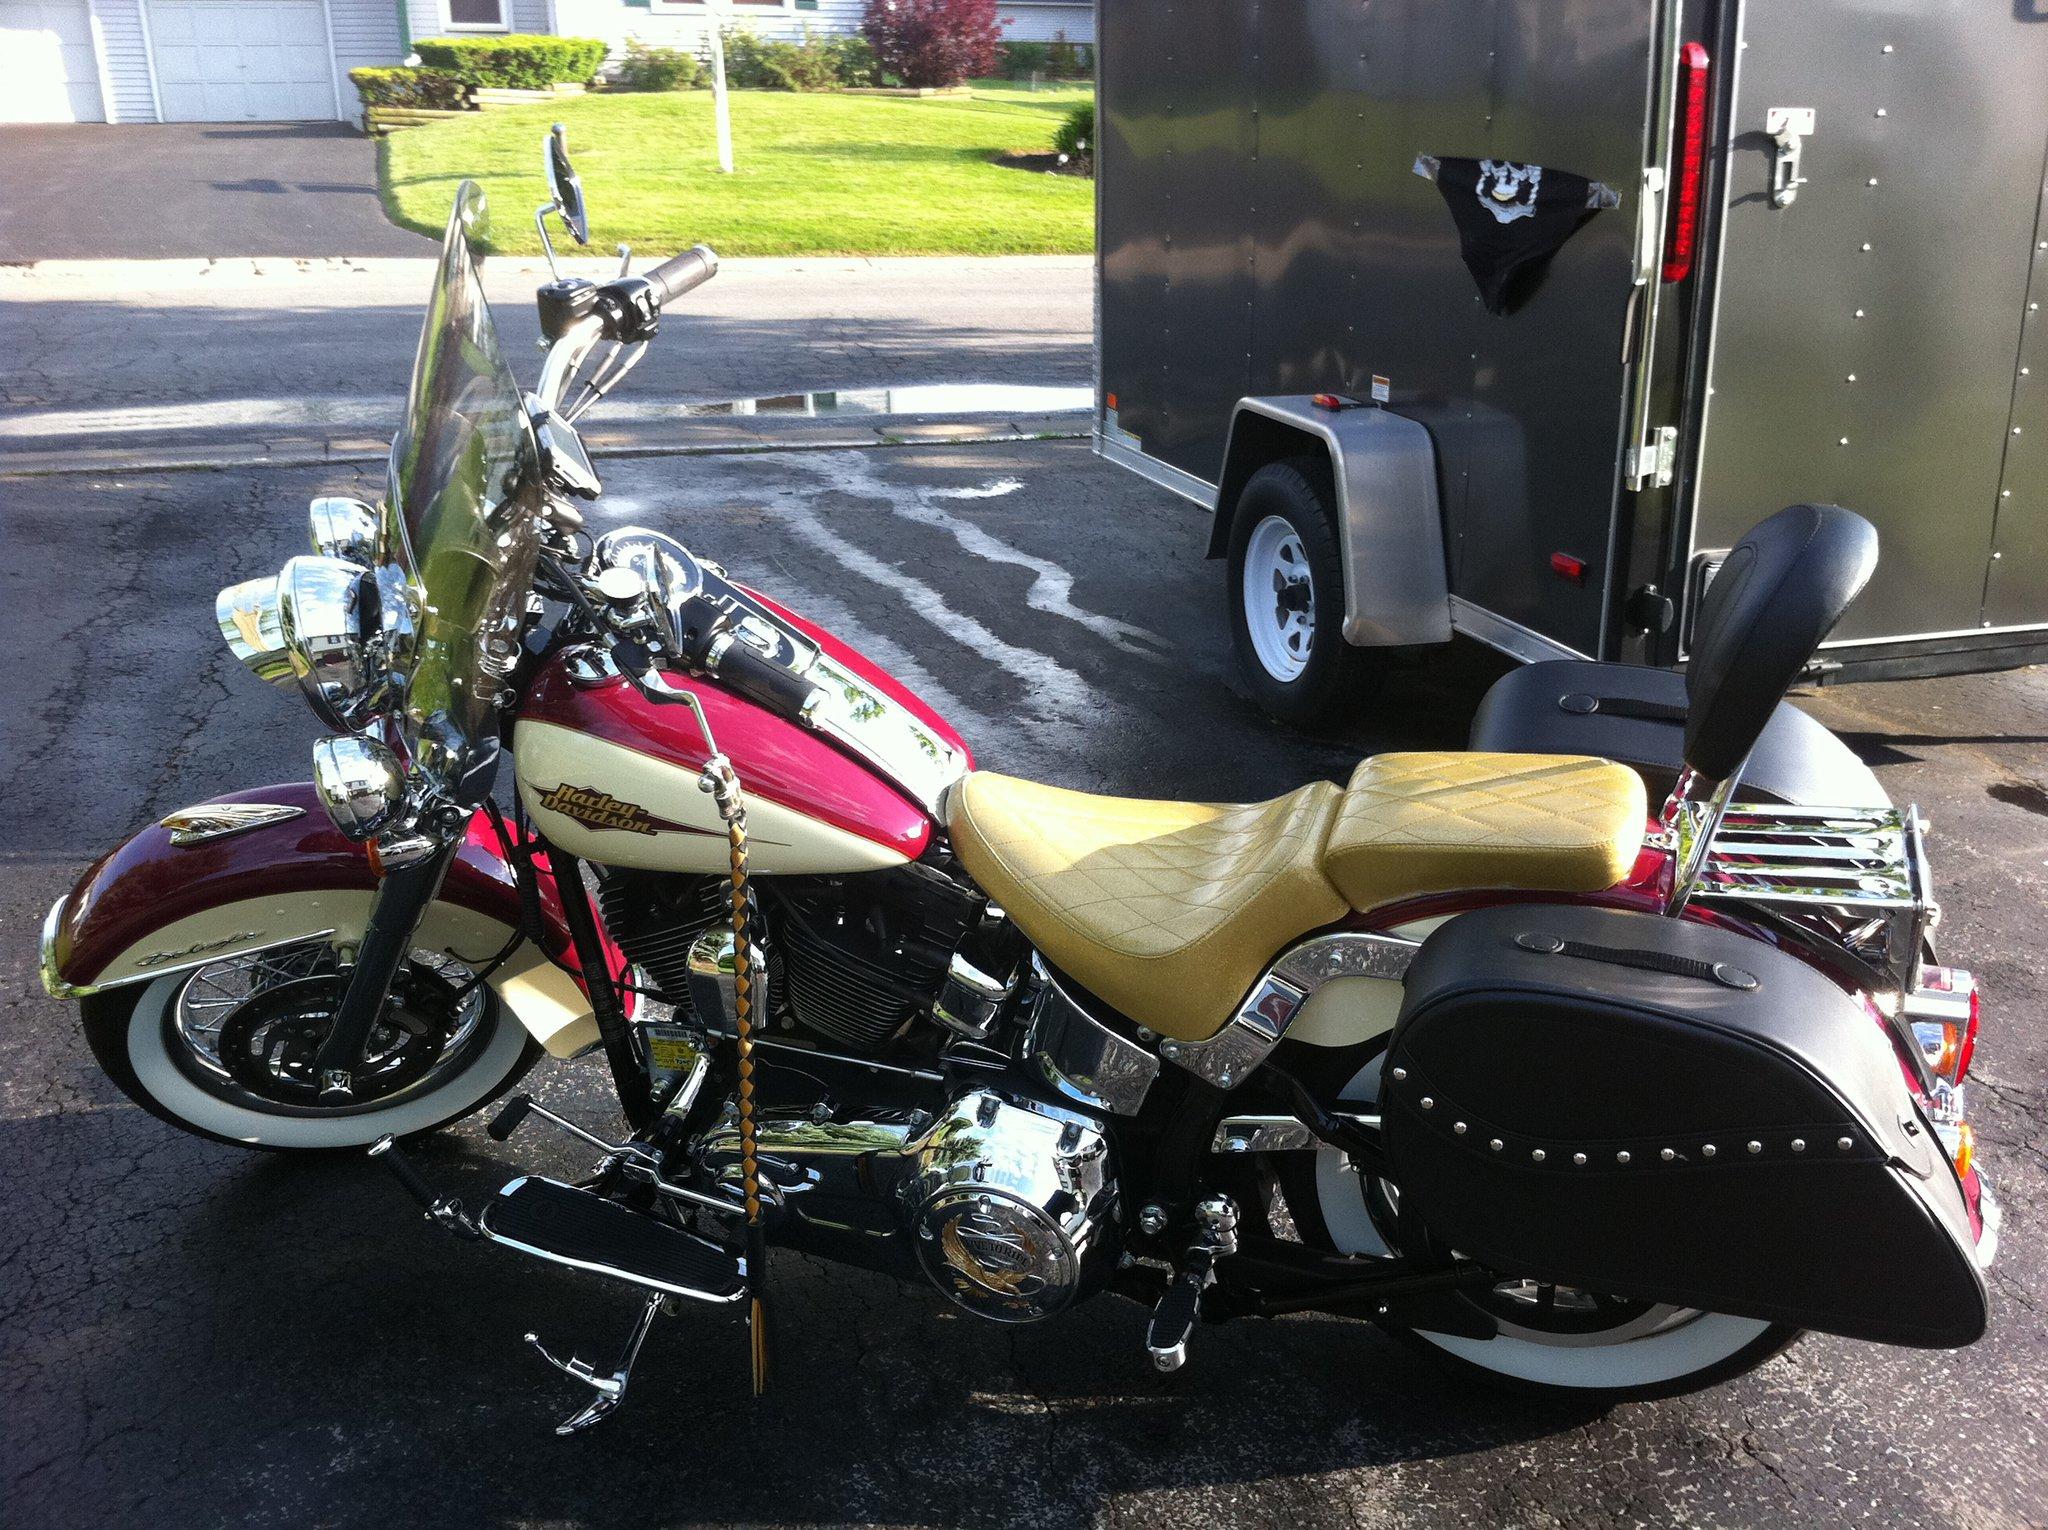 Kawasaki vulcan 900 classic saddlebags large ultimate for Yamaha raider hard saddlebags